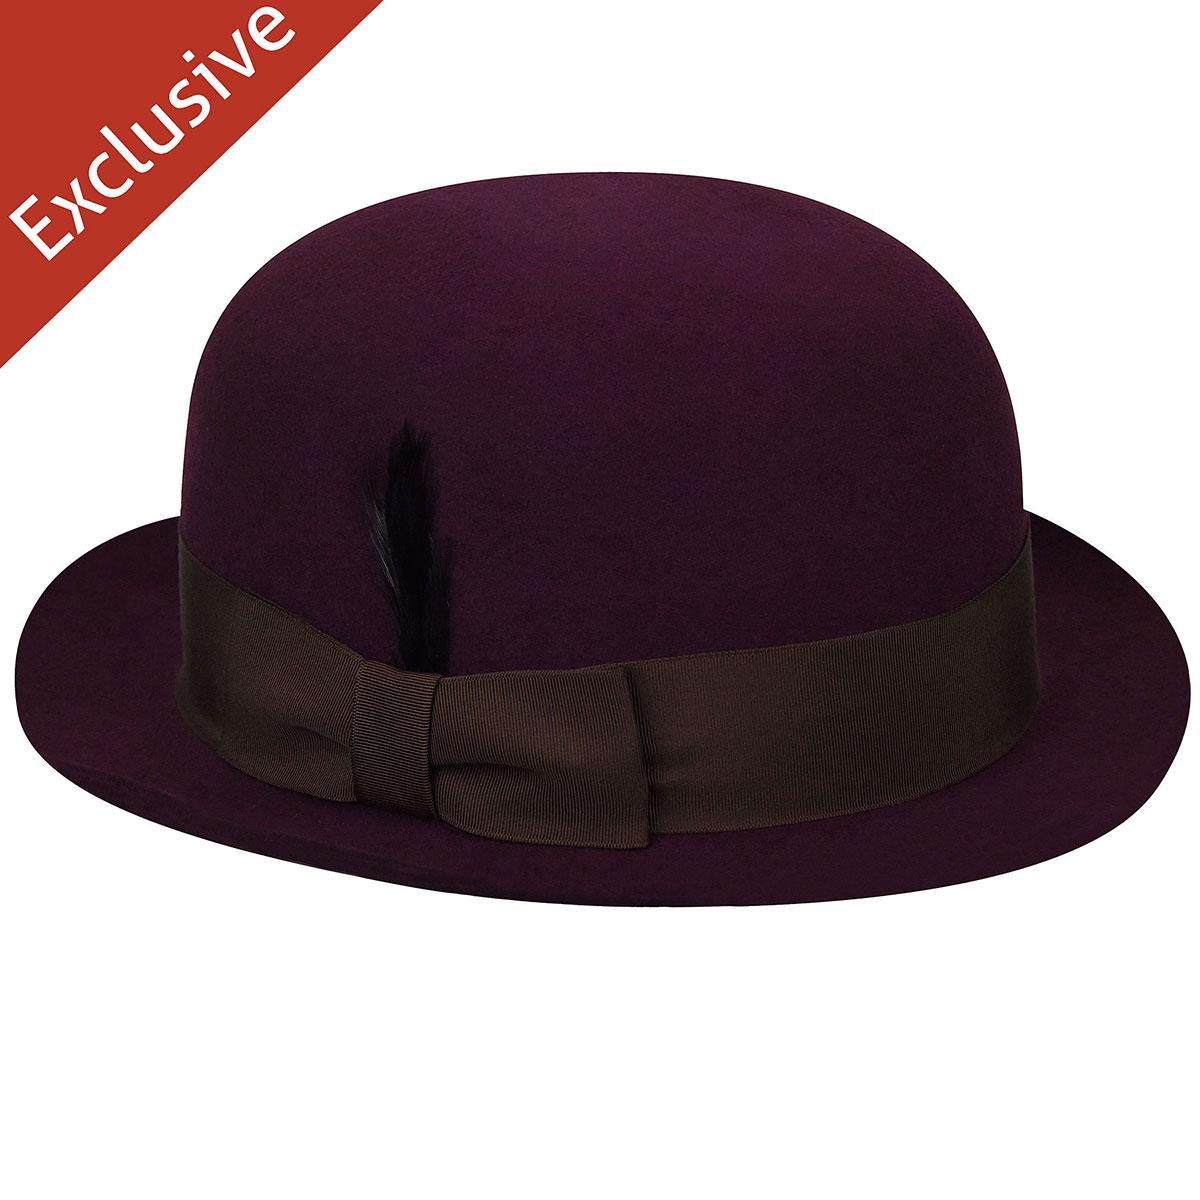 Hats.com Renee Bowler in Eggplant